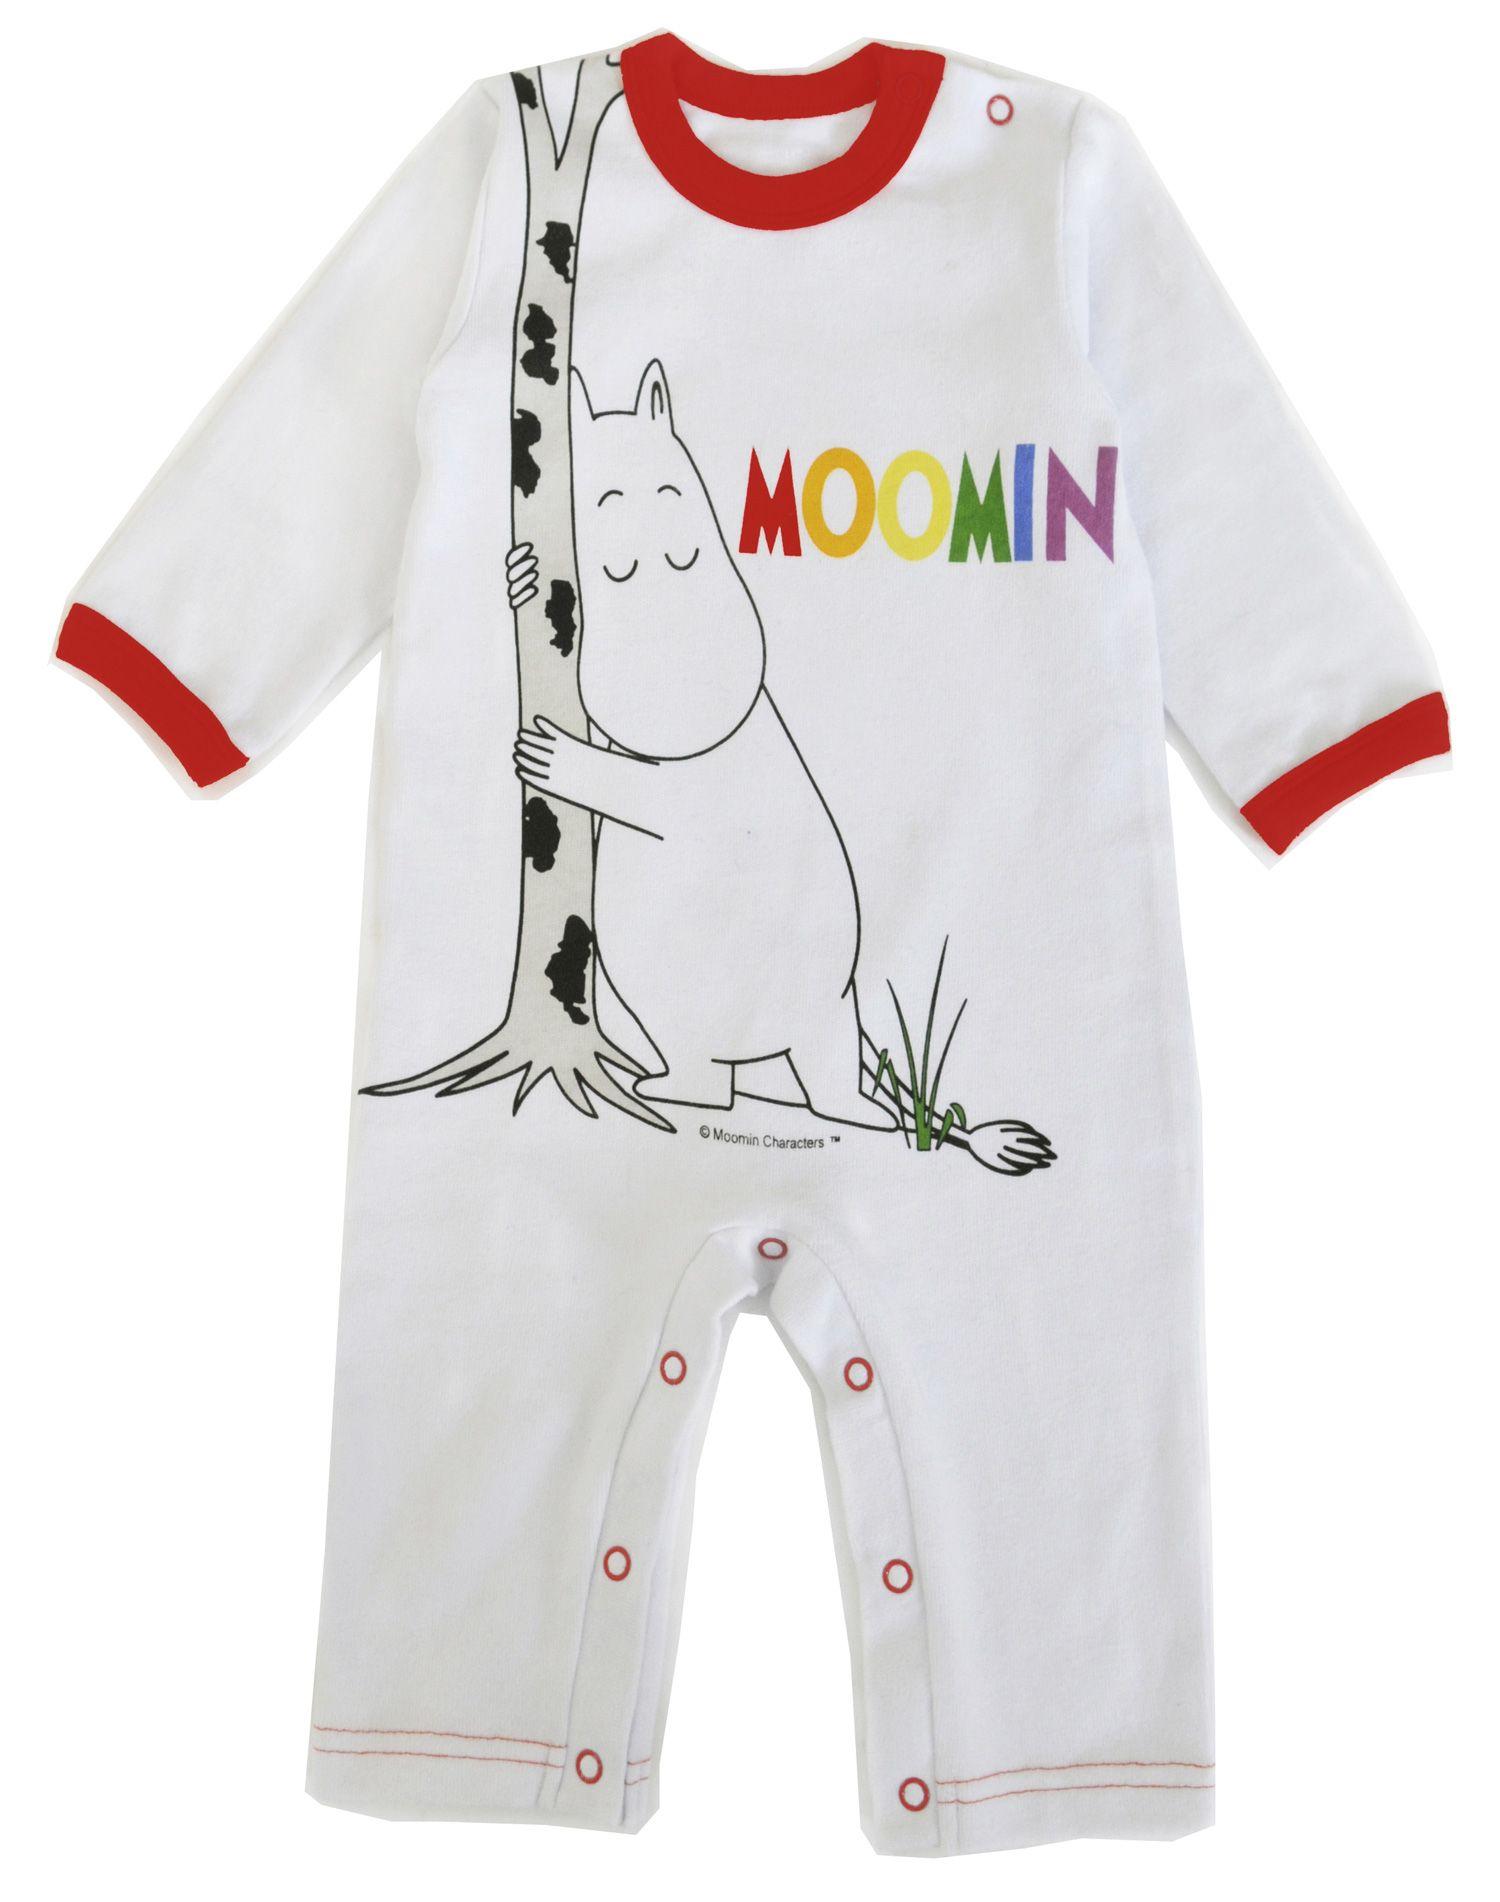 05b1767808b2 Moomin Baby Grow